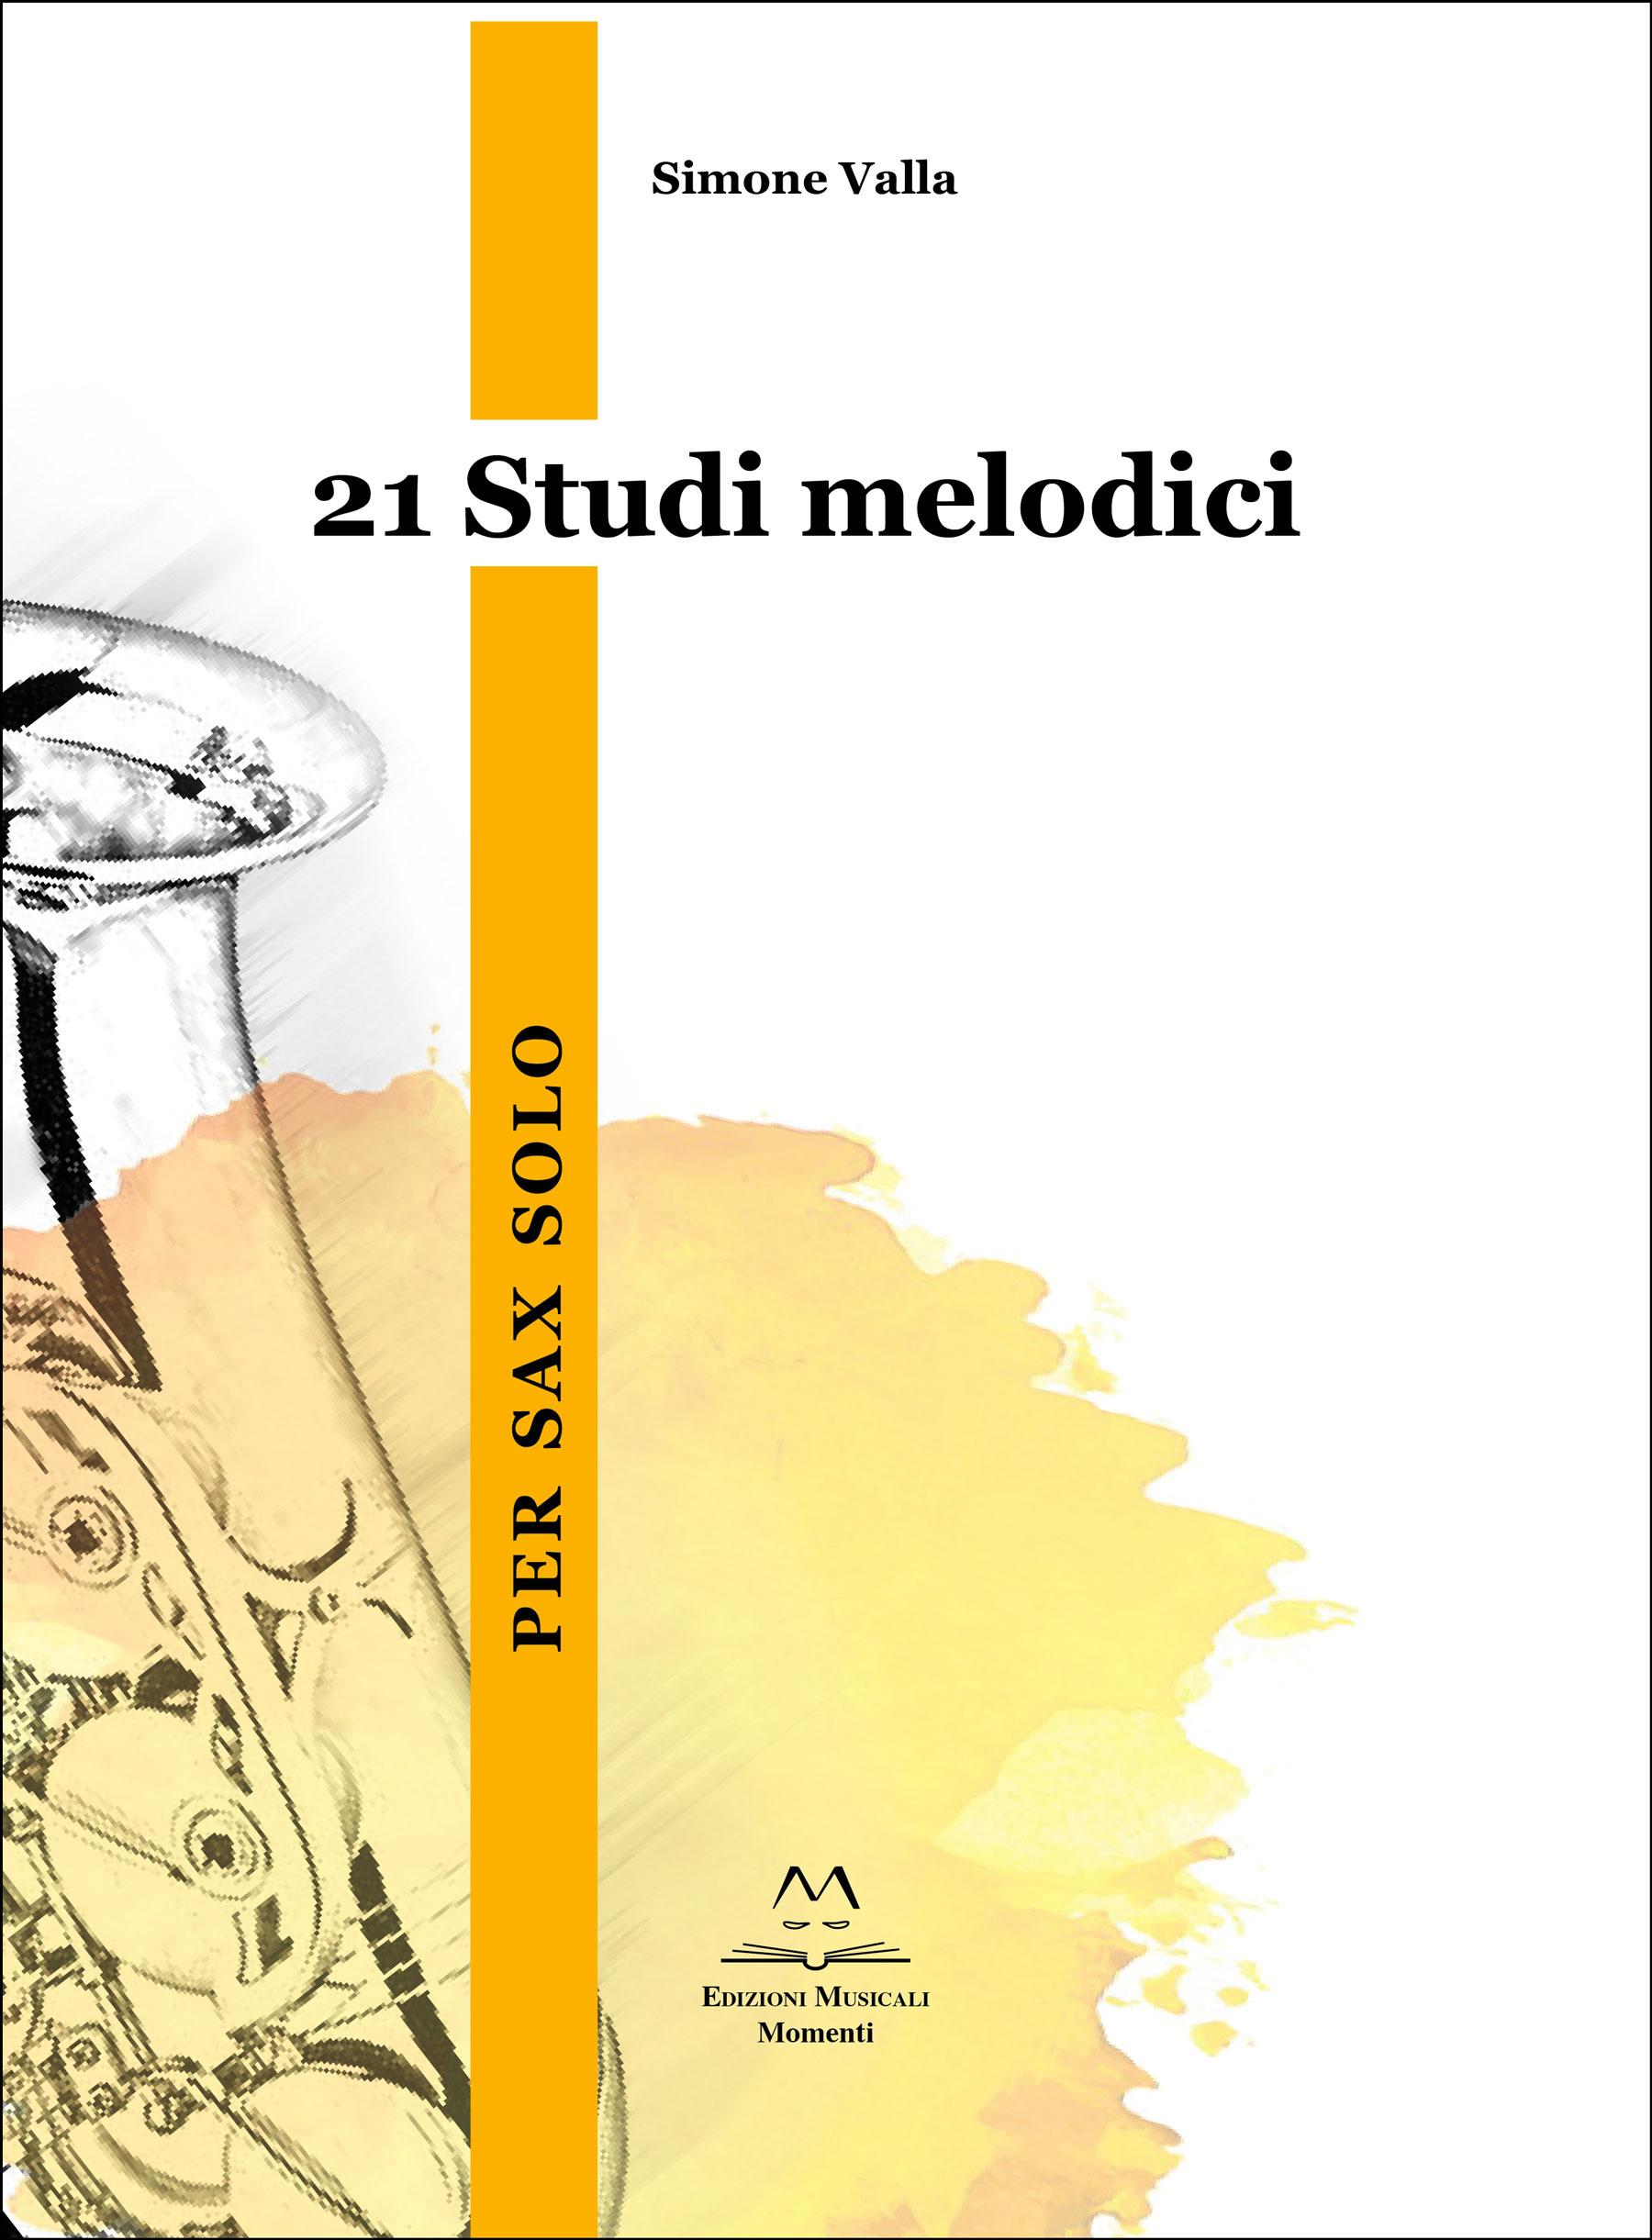 21 Studi melodici